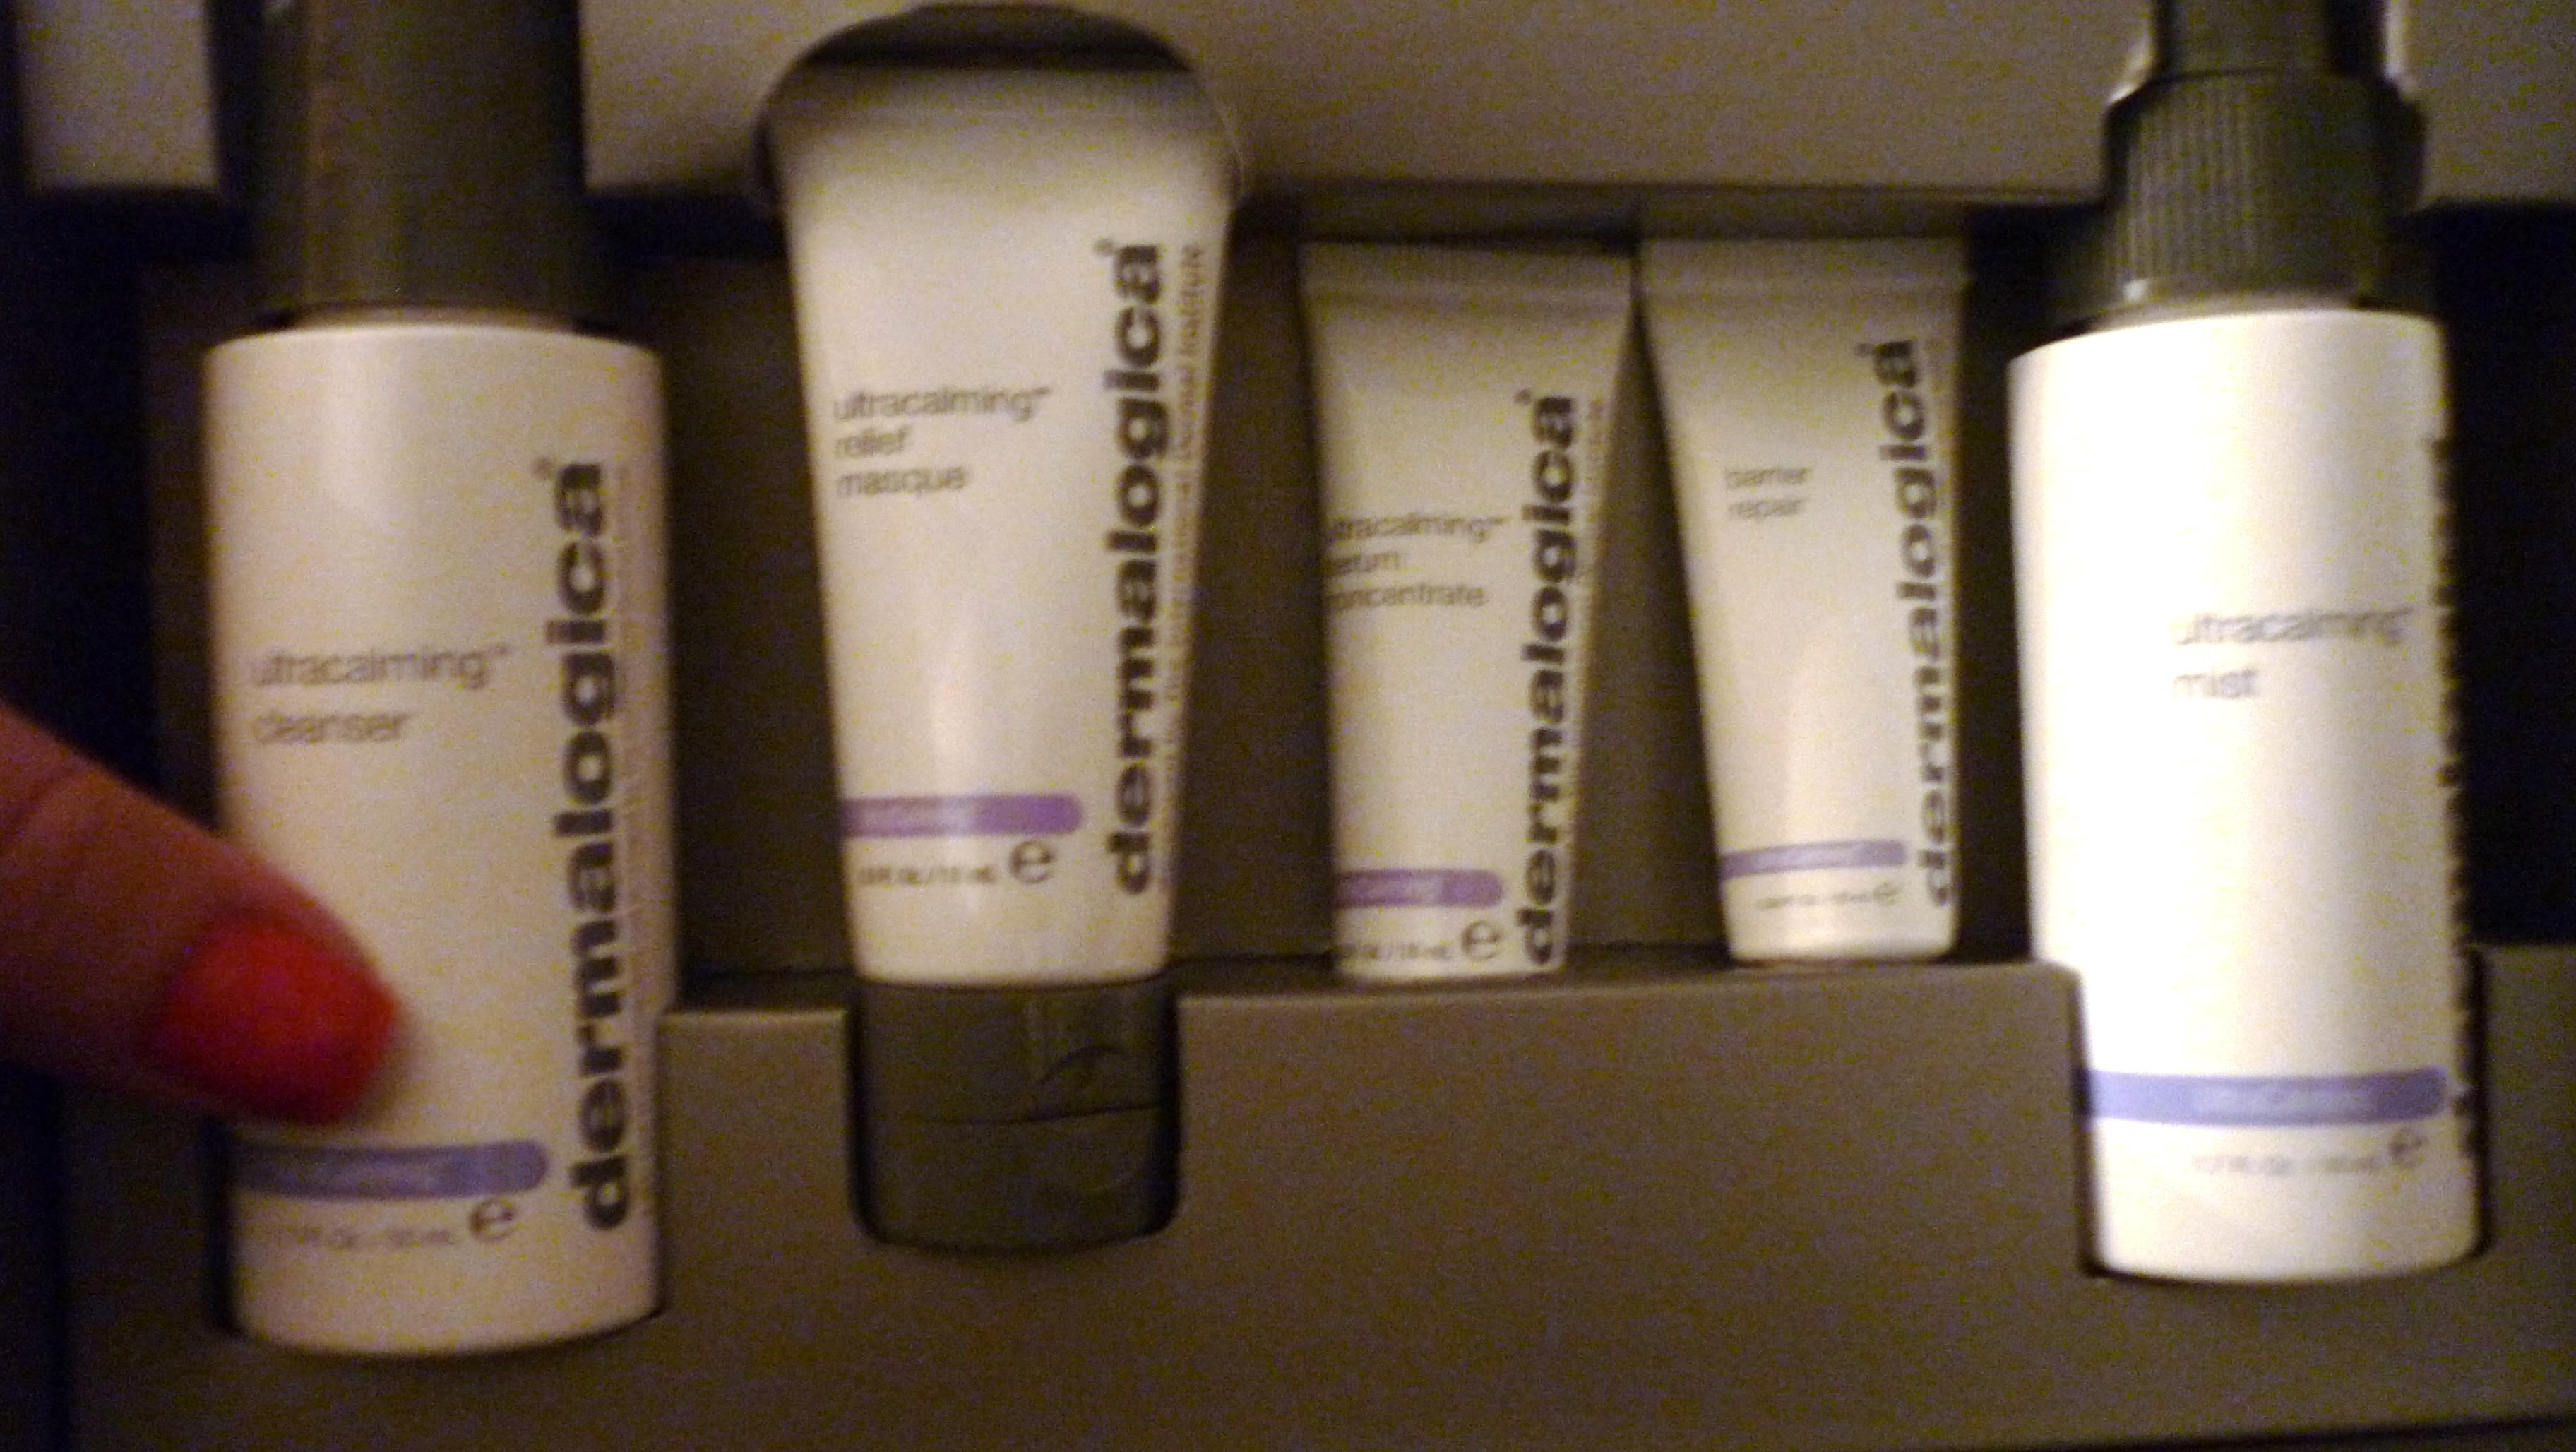 dermalogica ultra calming moisturizer